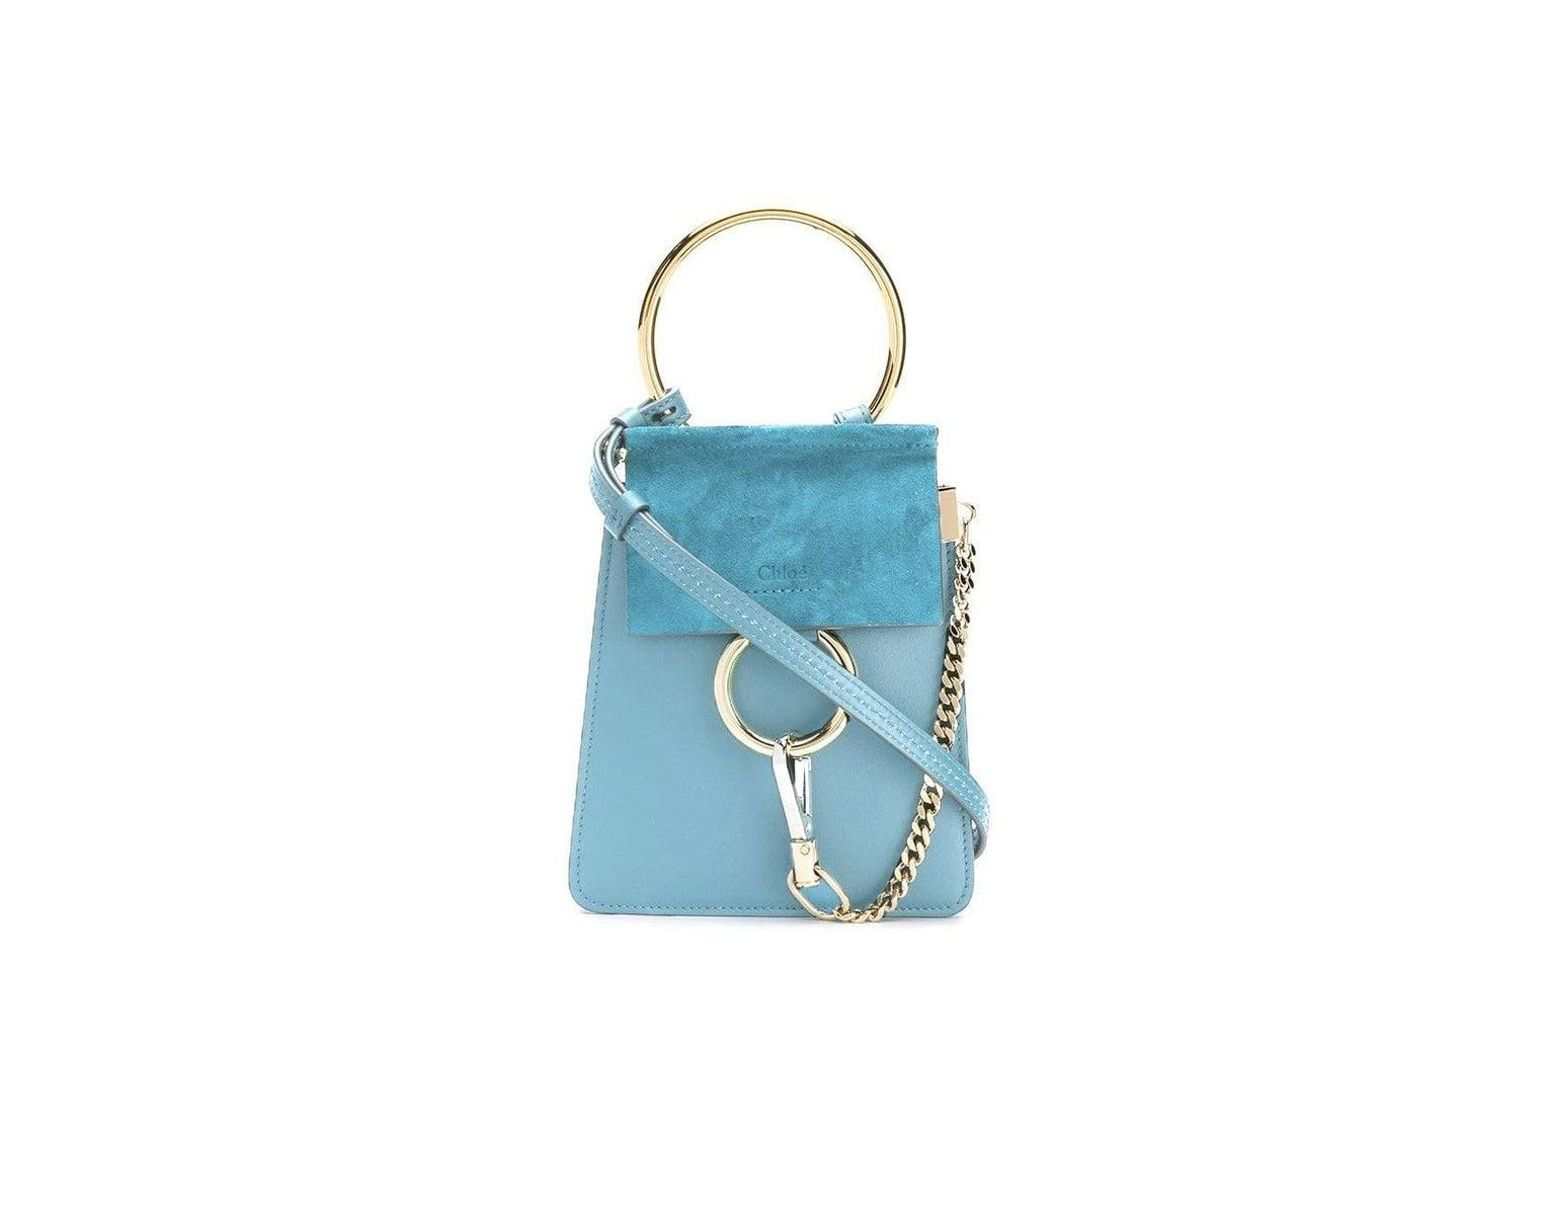 1f672f4b Chloé Faye Mini Bag, Tomboy Blue in Blue - Lyst